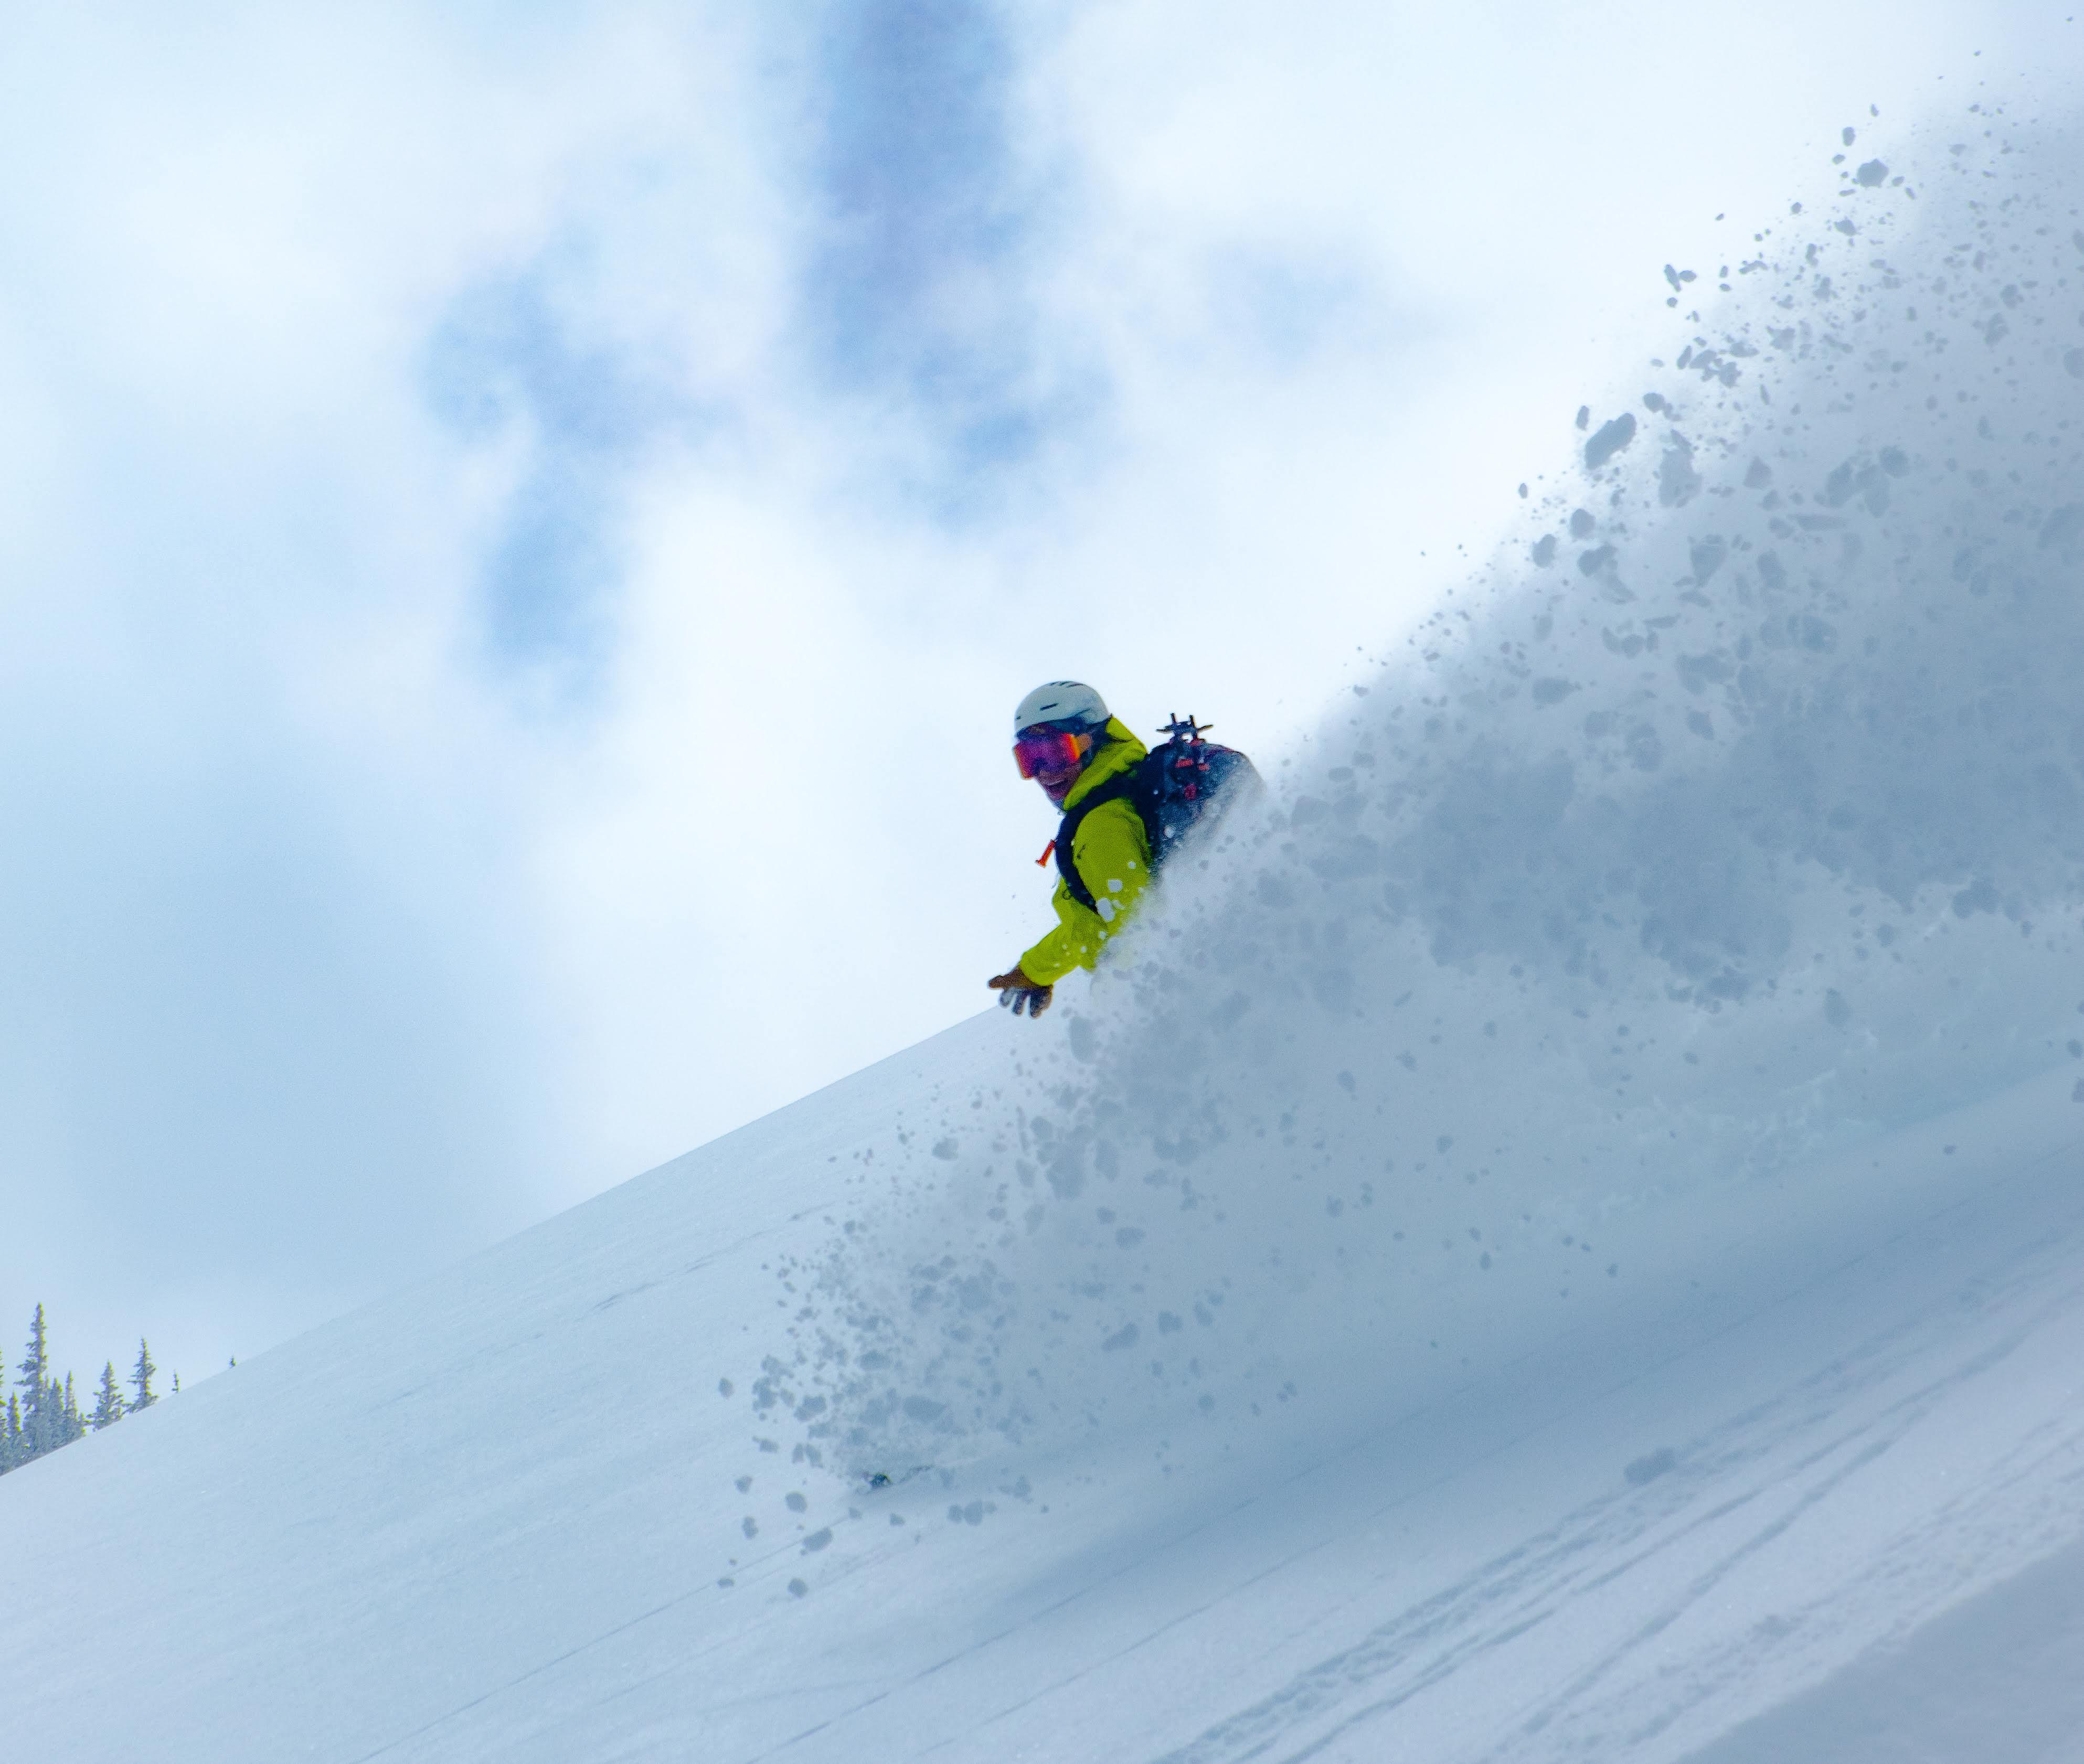 Dani-Reyes-Acosta-Splitboards-Teton-Pass-Photo-by-Junior-Rodriguez-@JrRdrgz 3